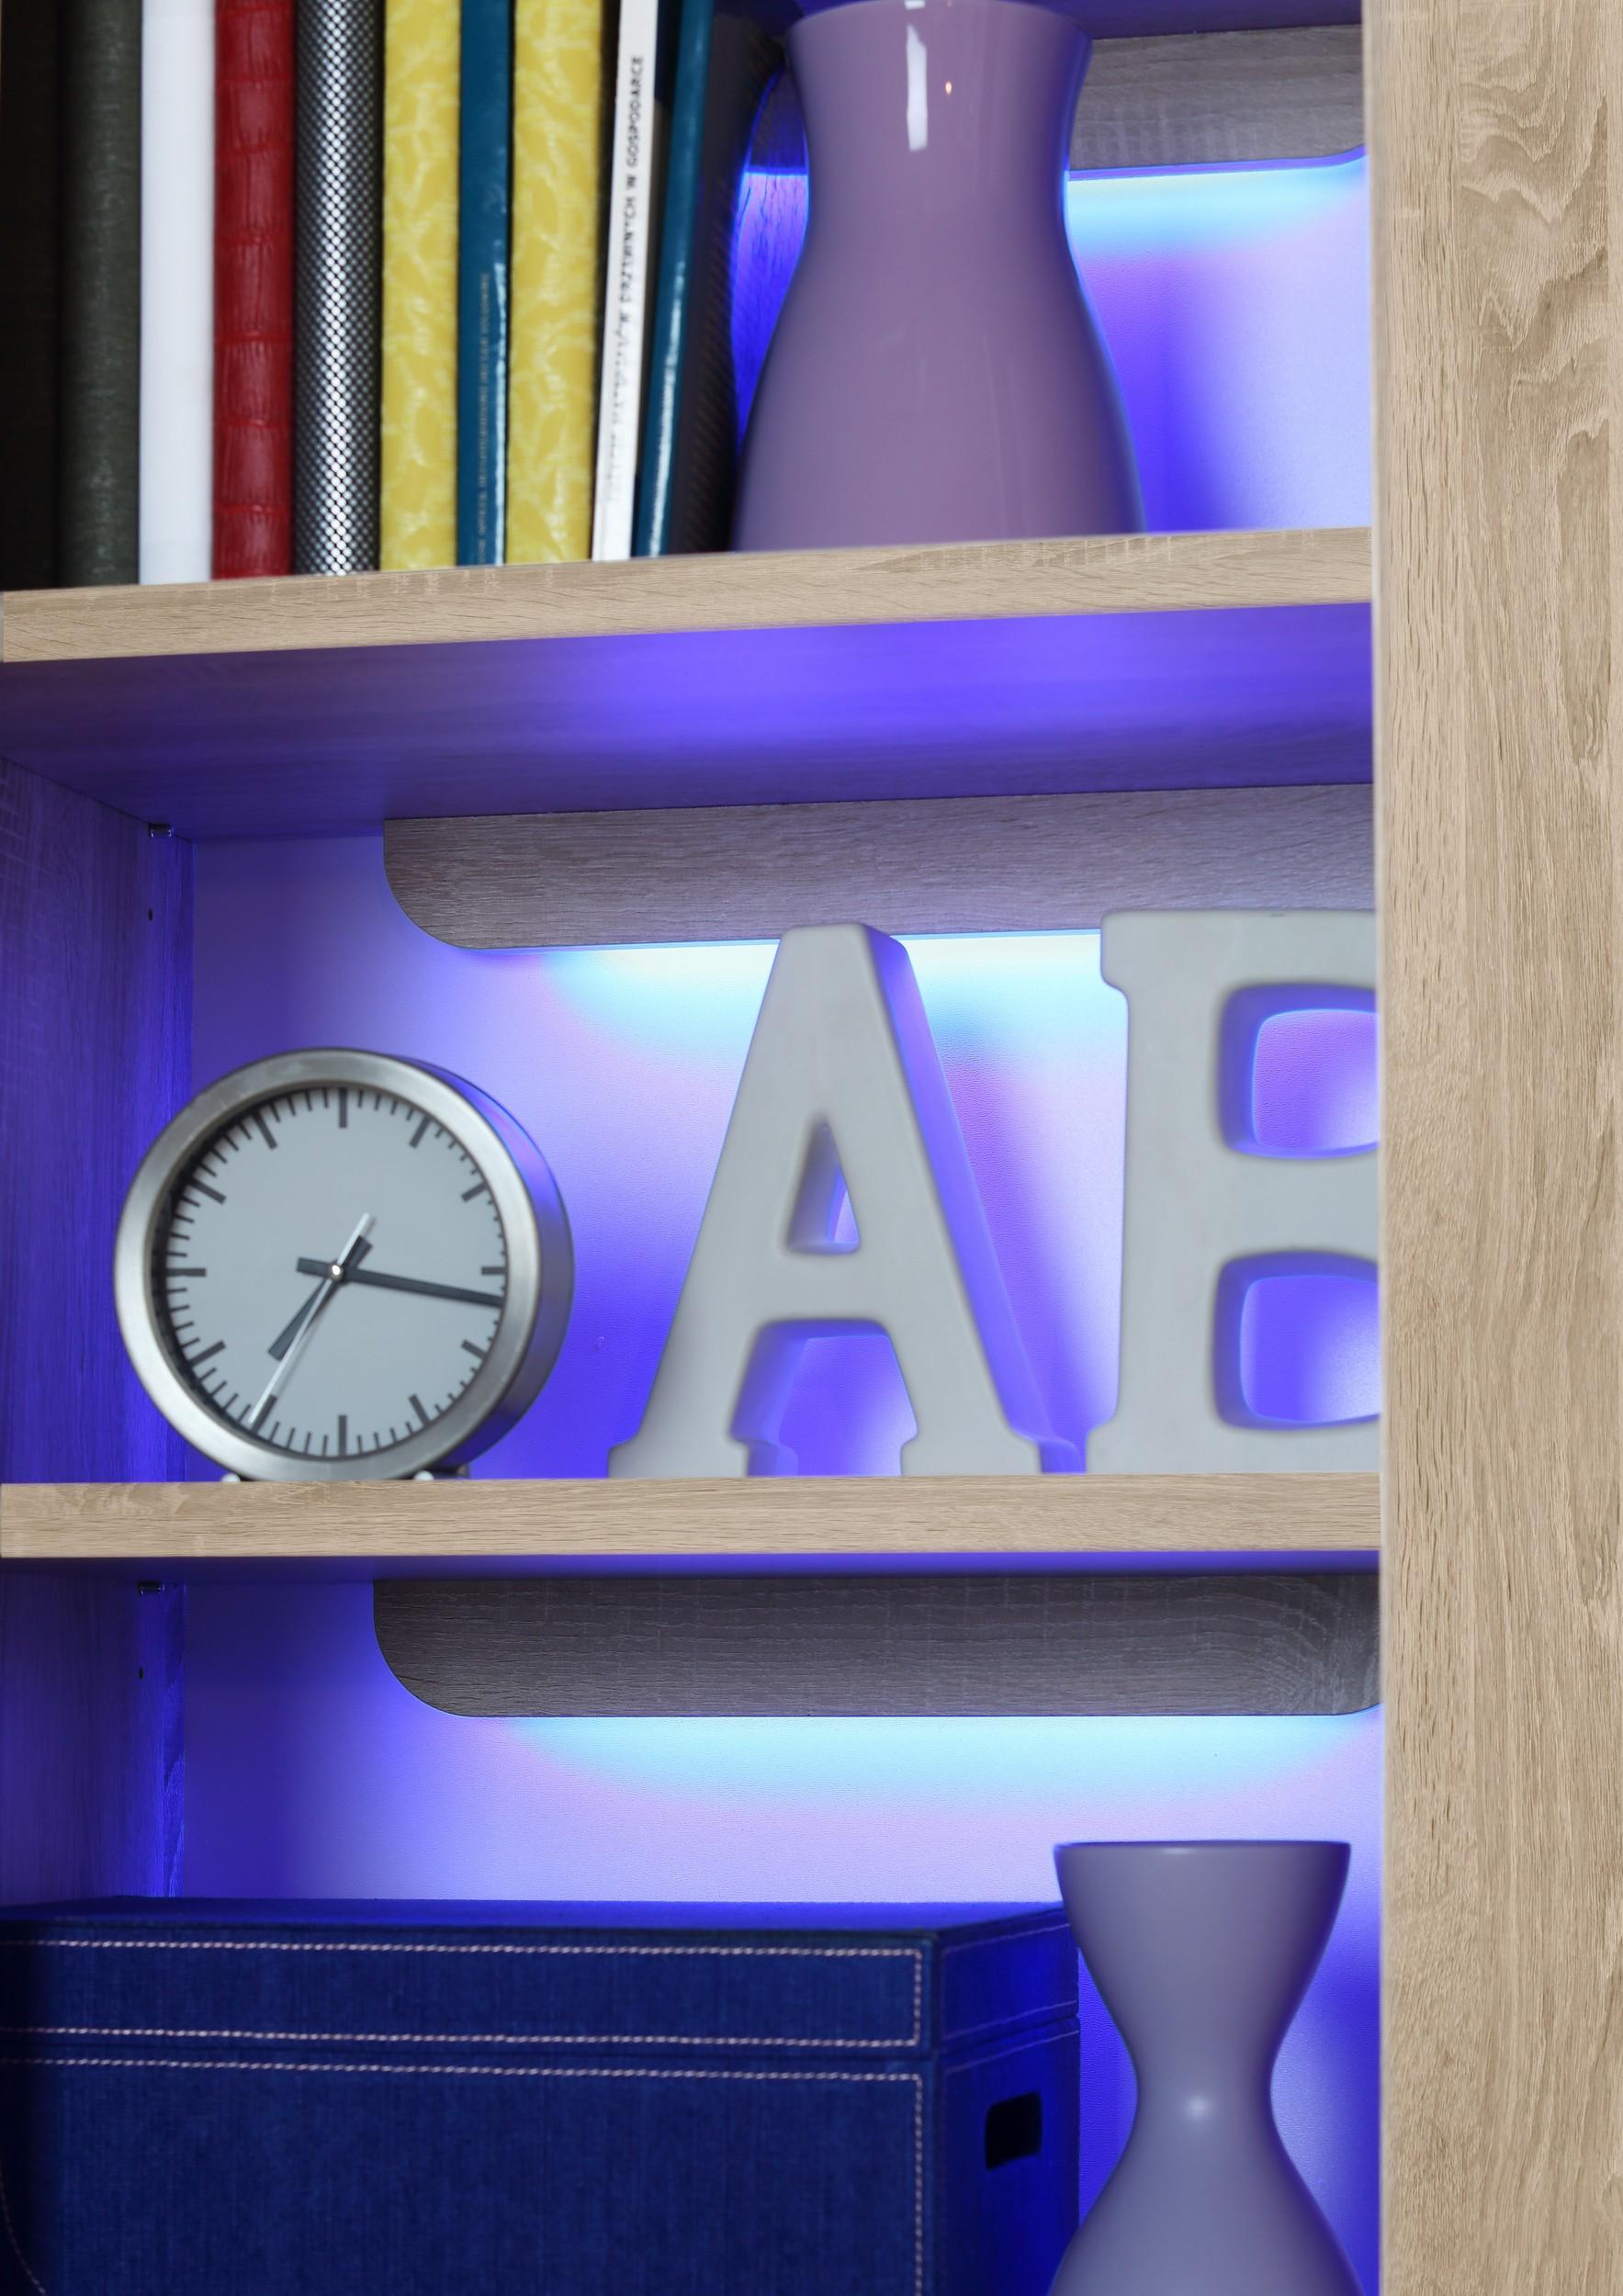 Ebay Jugendzimmer | LCXB21 11